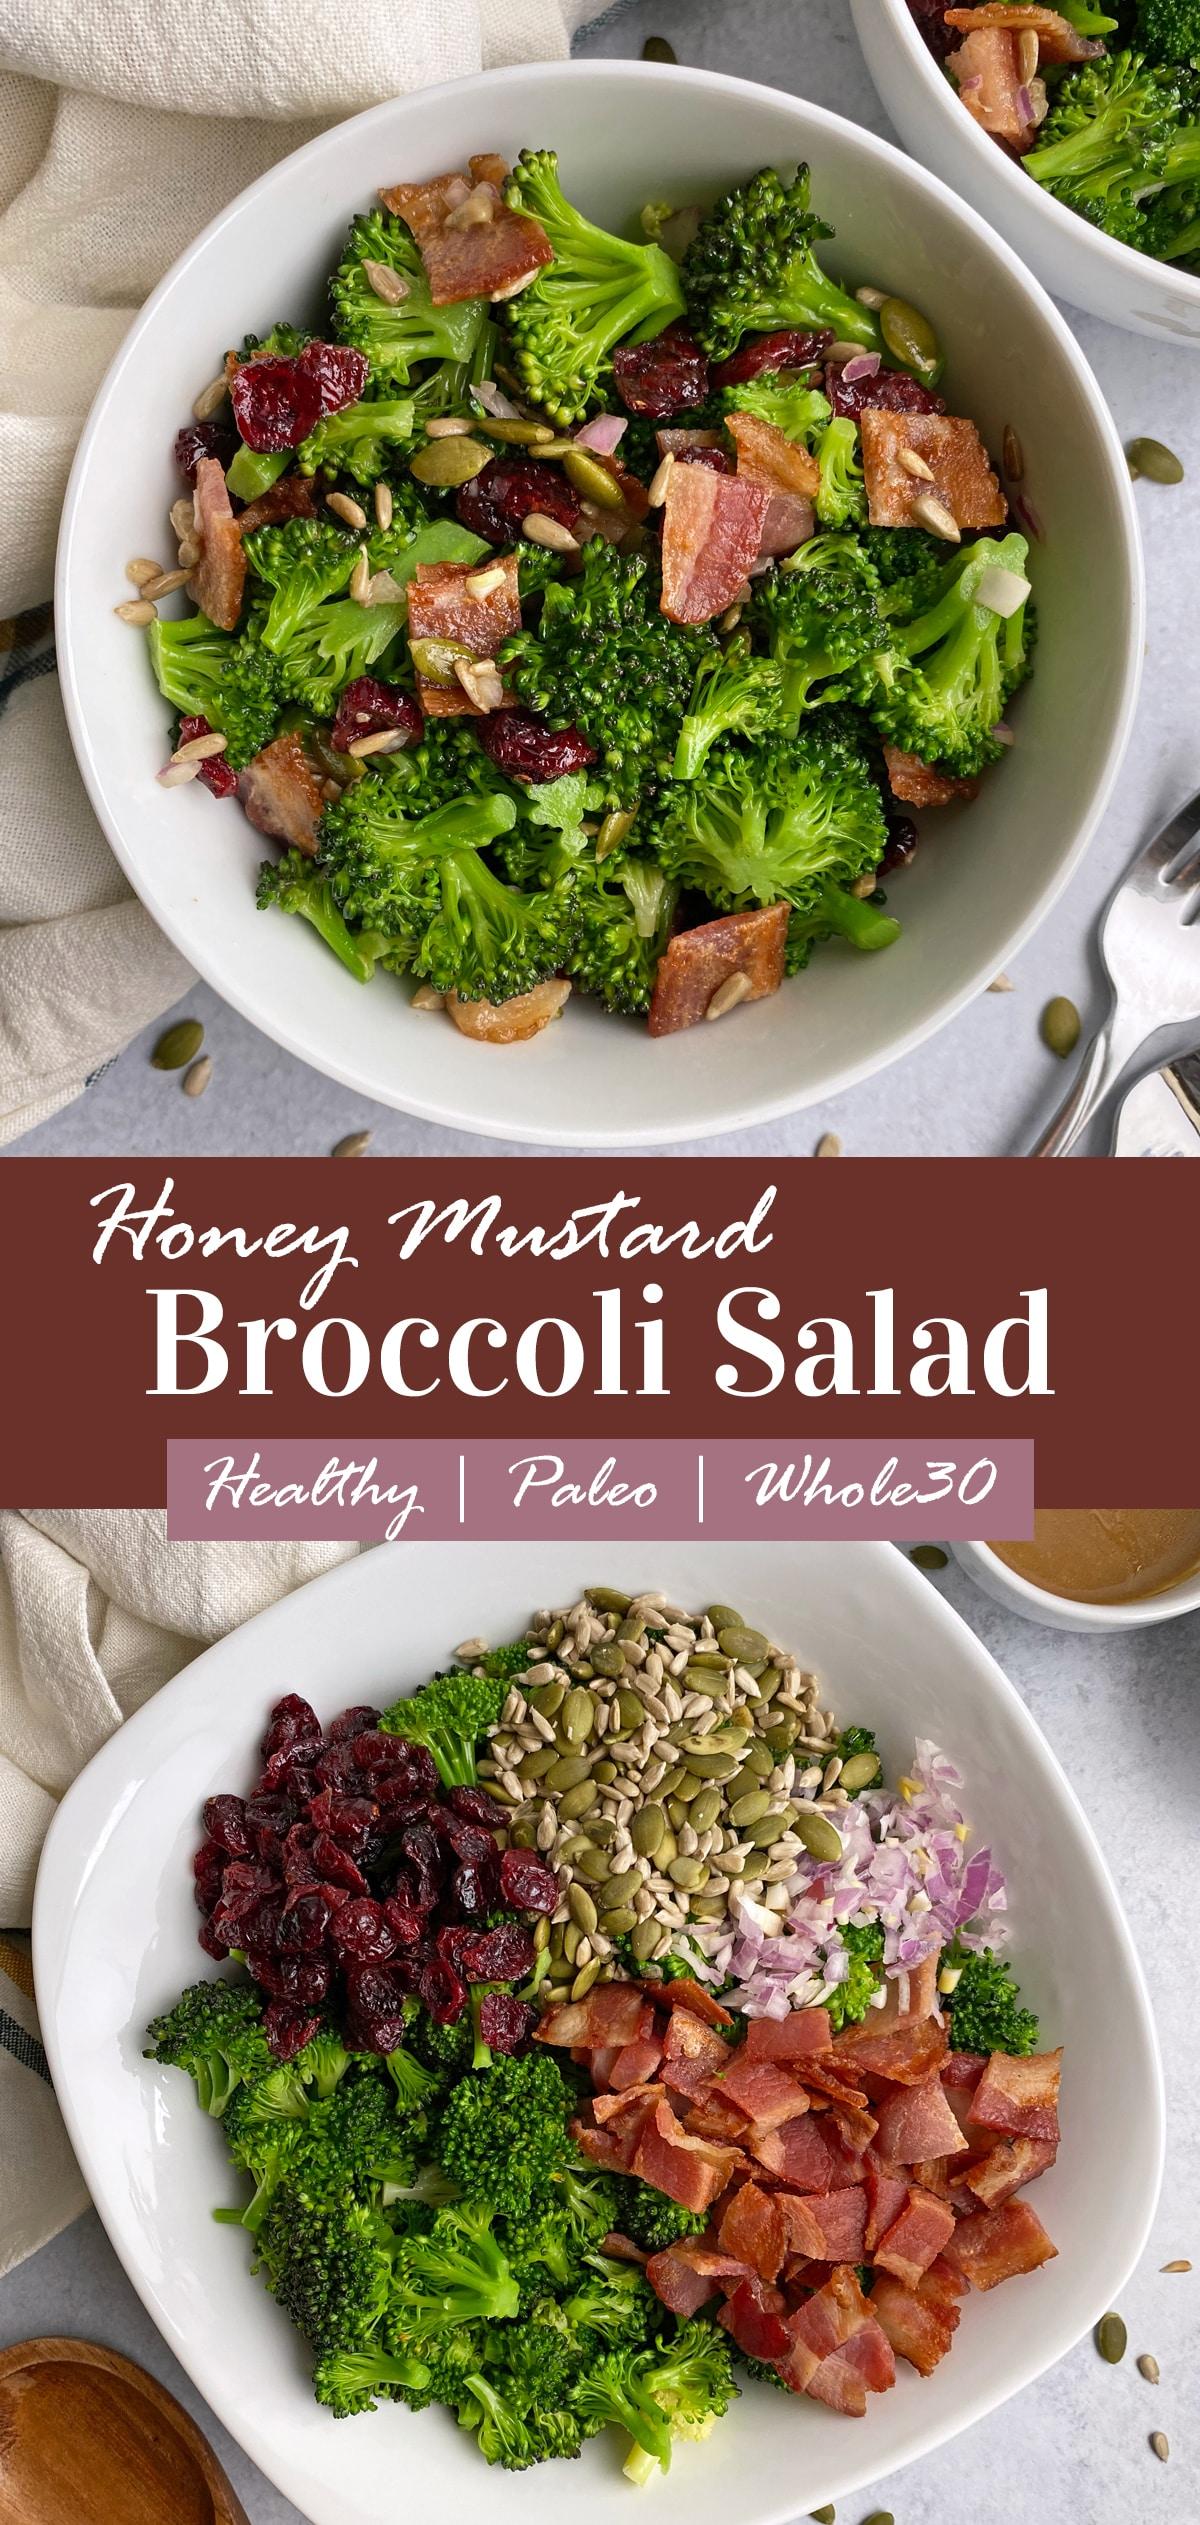 honey-mustard-broccoli-salad-recipe-pinterest-image